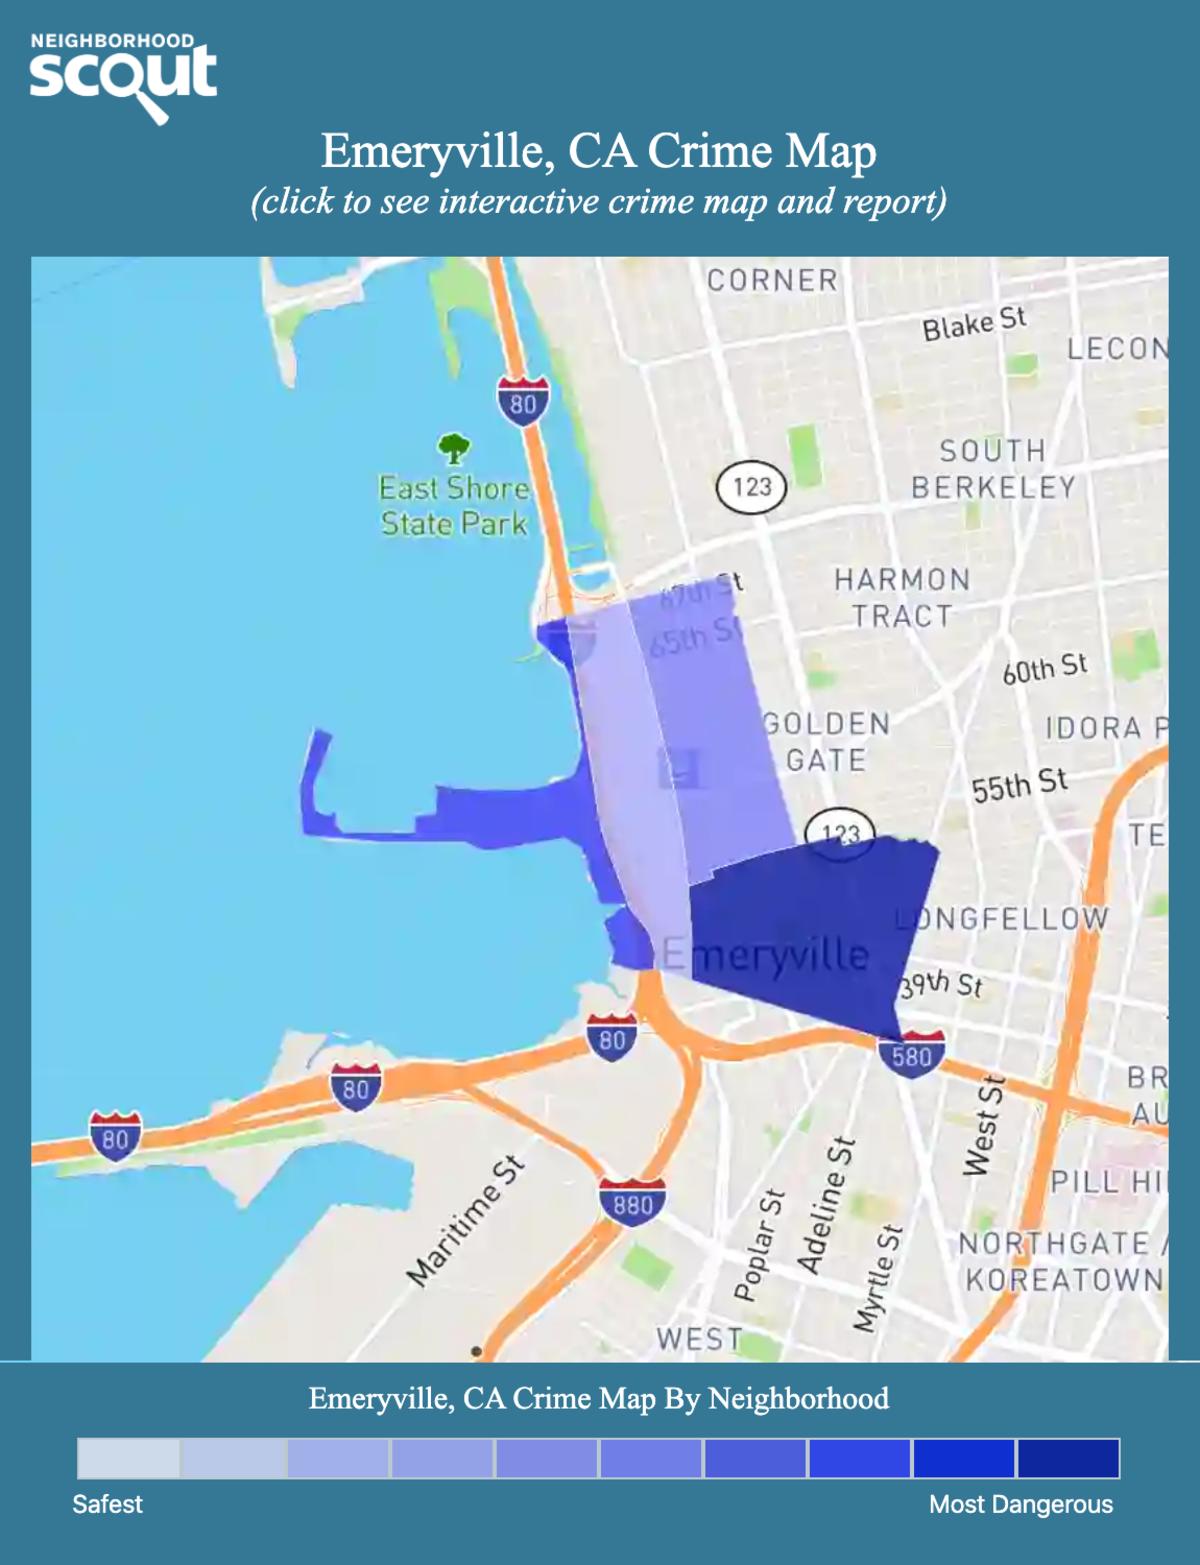 Emeryville, California crime map